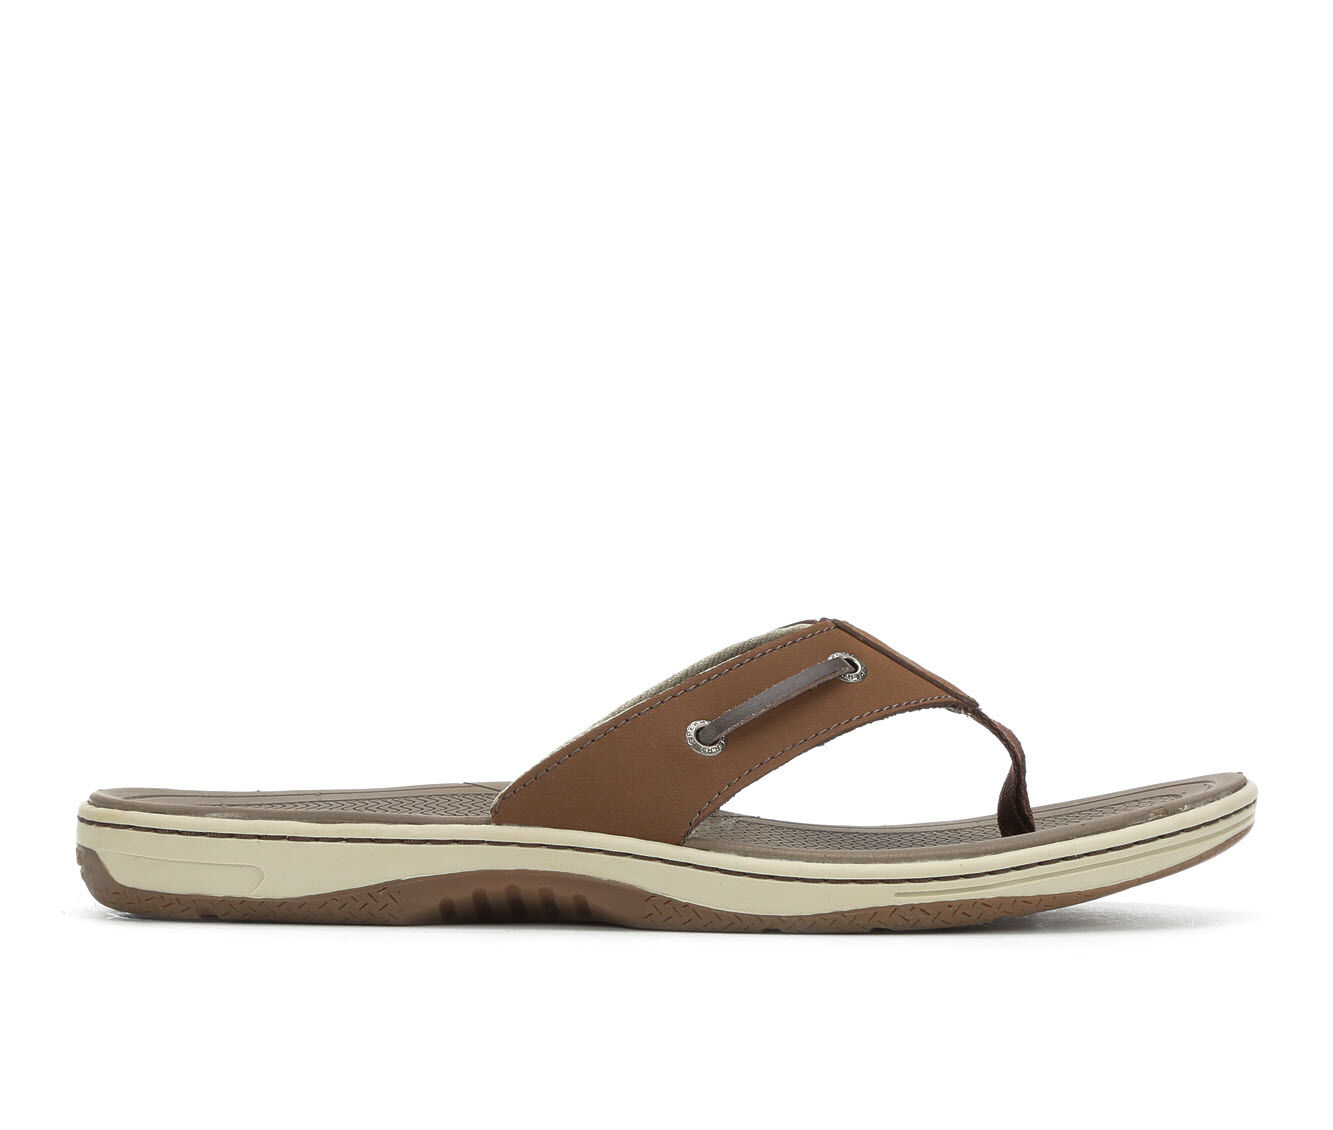 uk shoes_kd2645